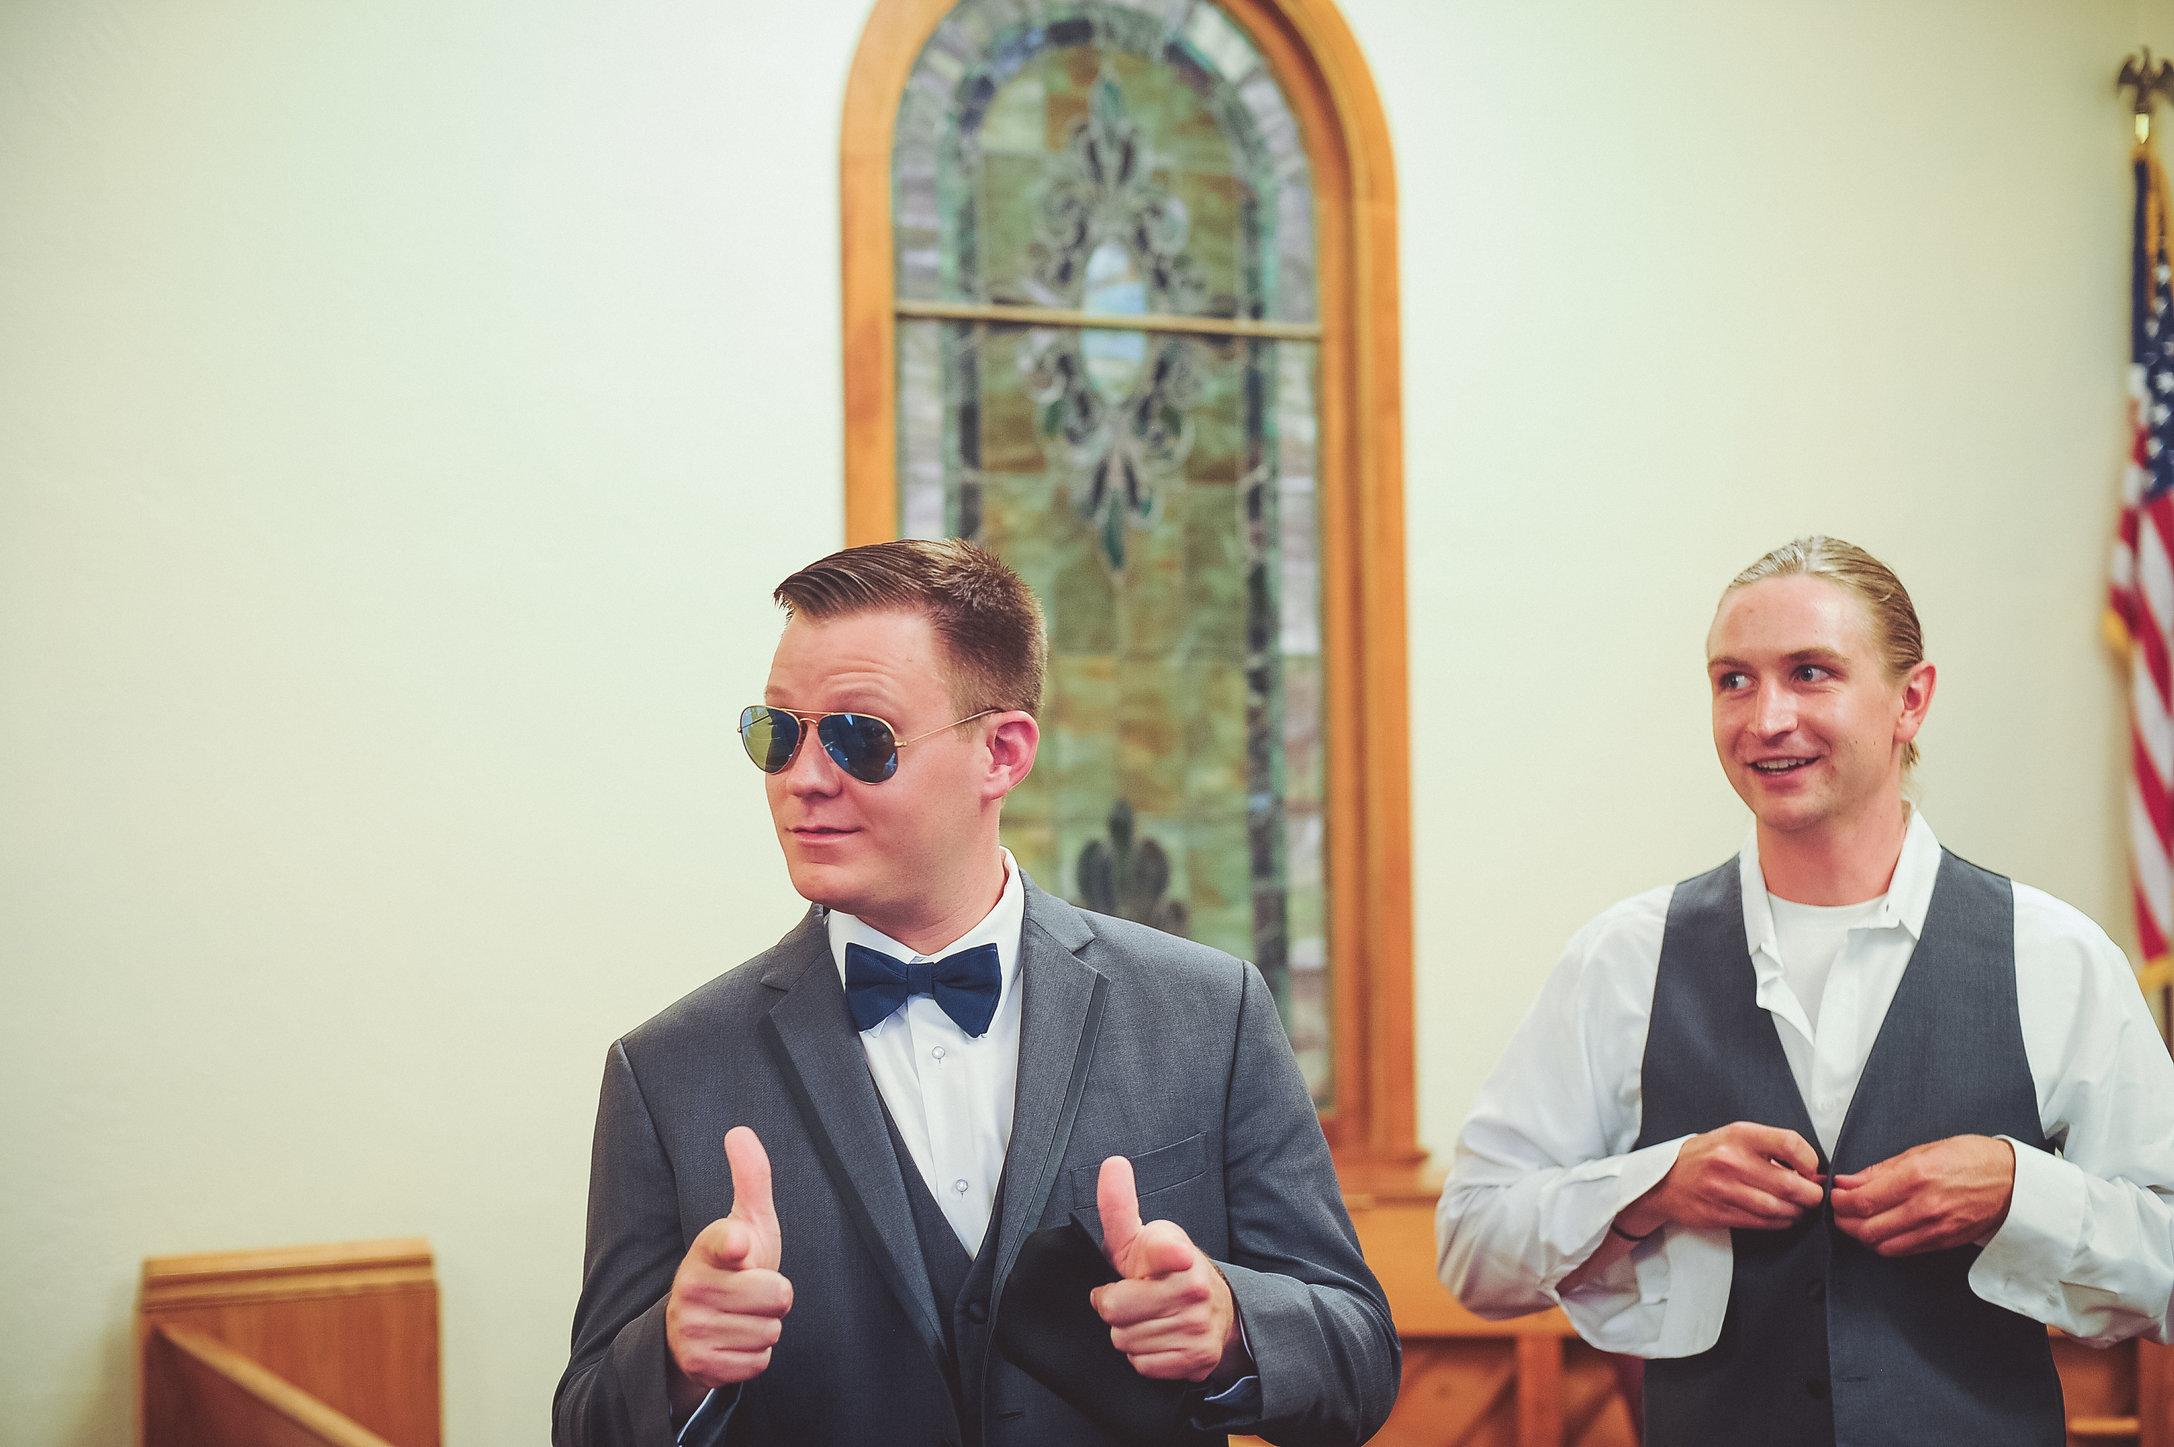 SandC-wedding-75.jpg